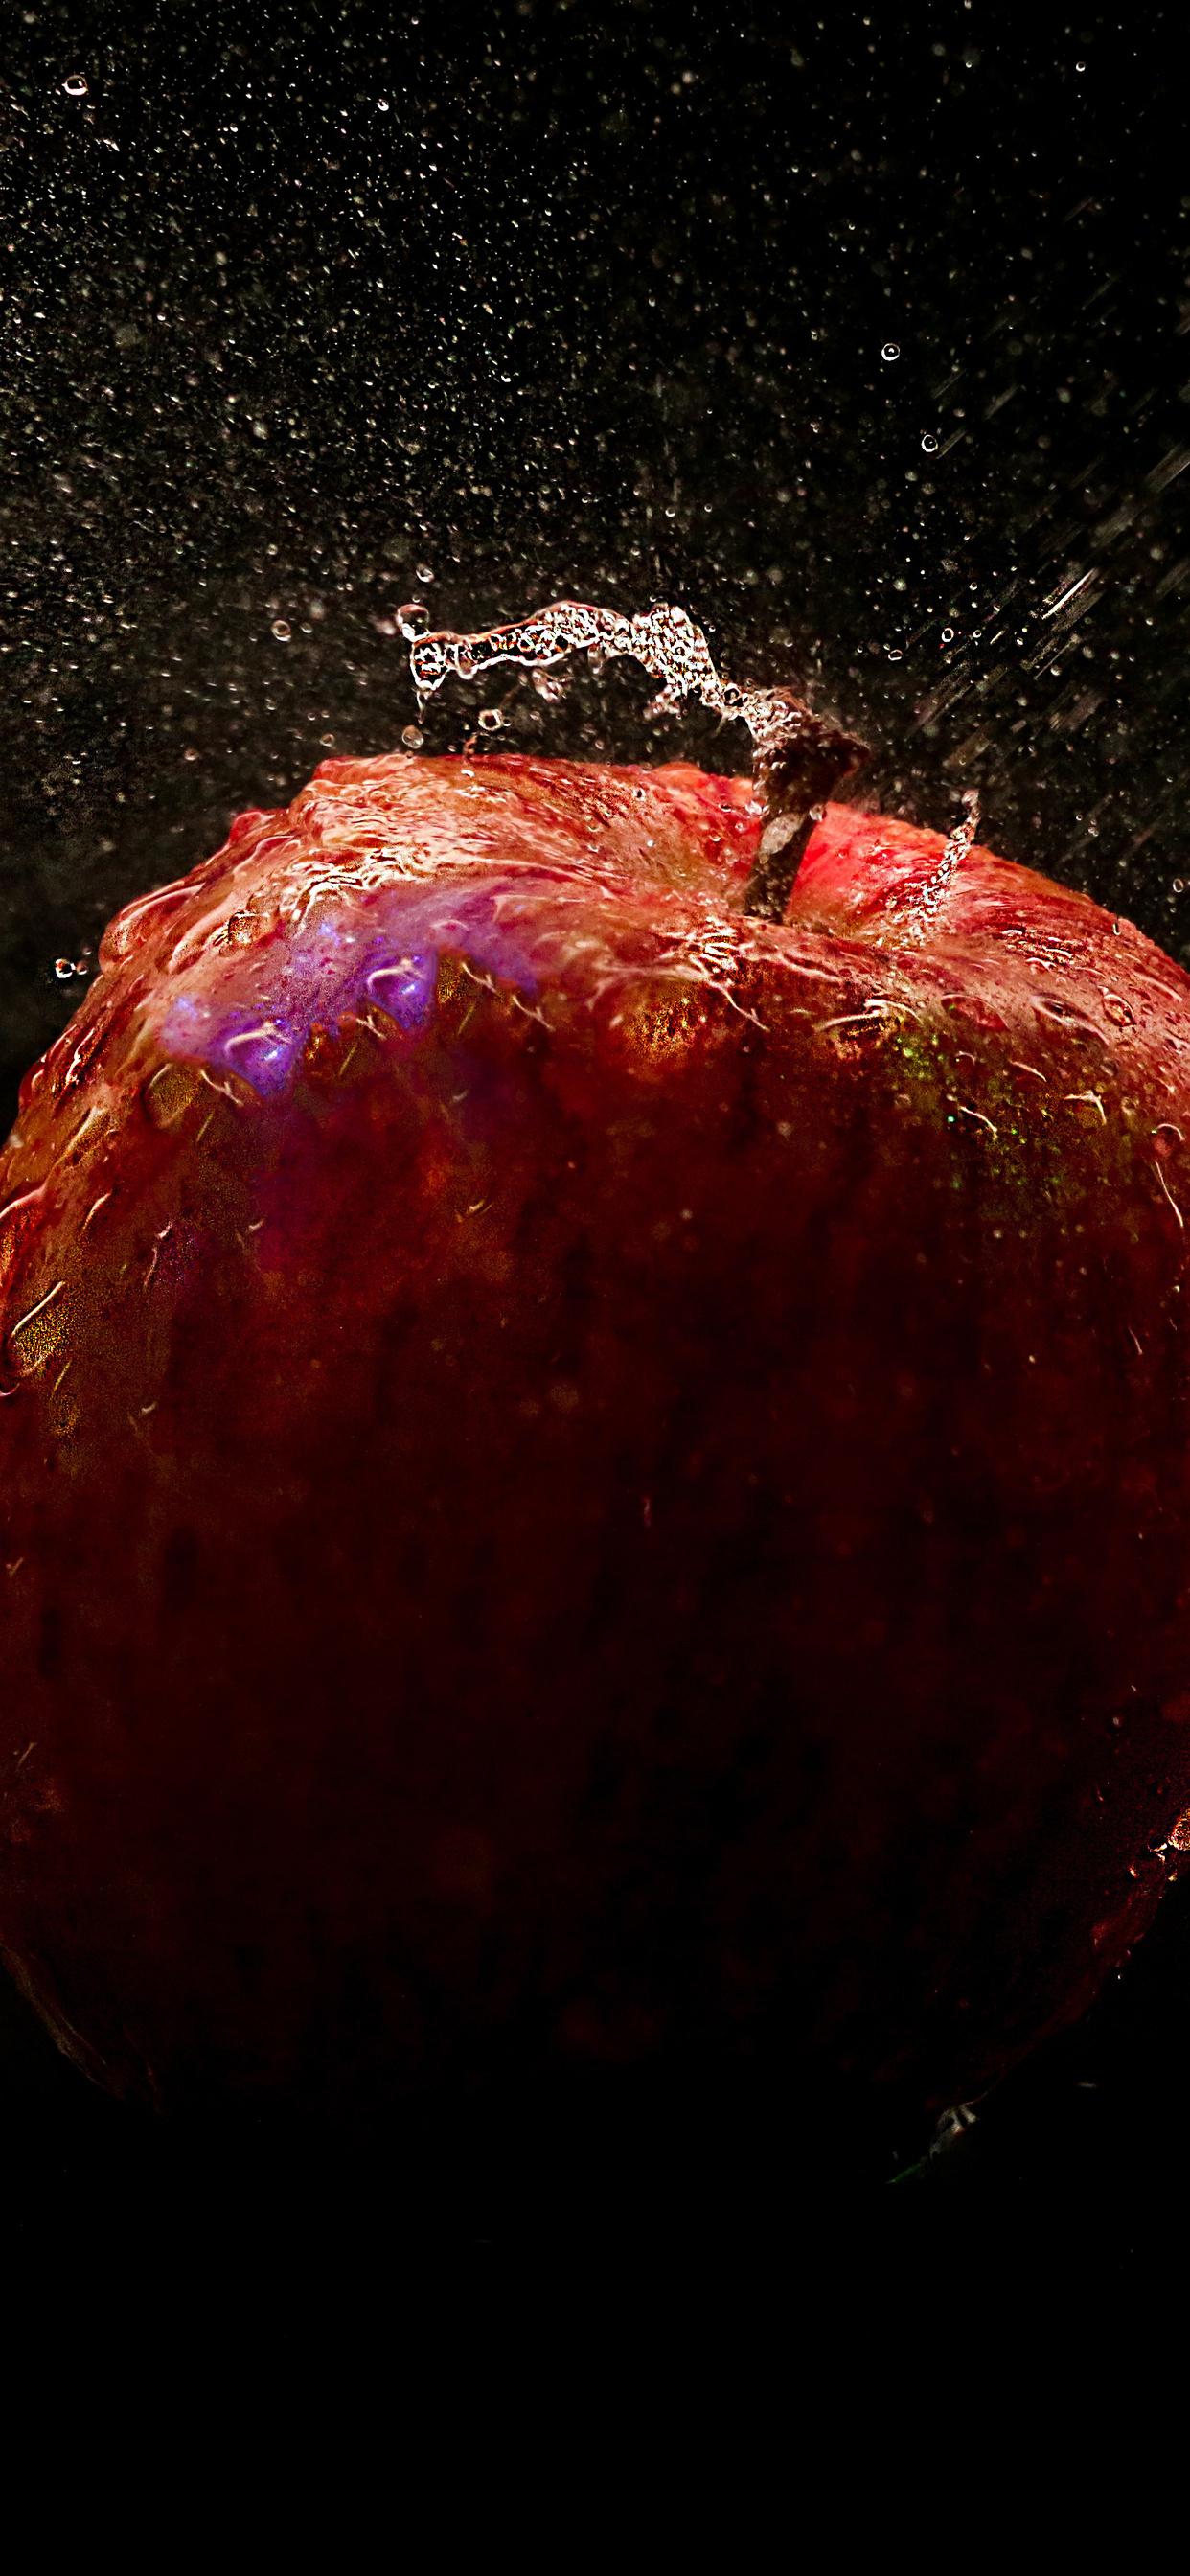 apple-time-lapse-photography-4k-tr.jpg